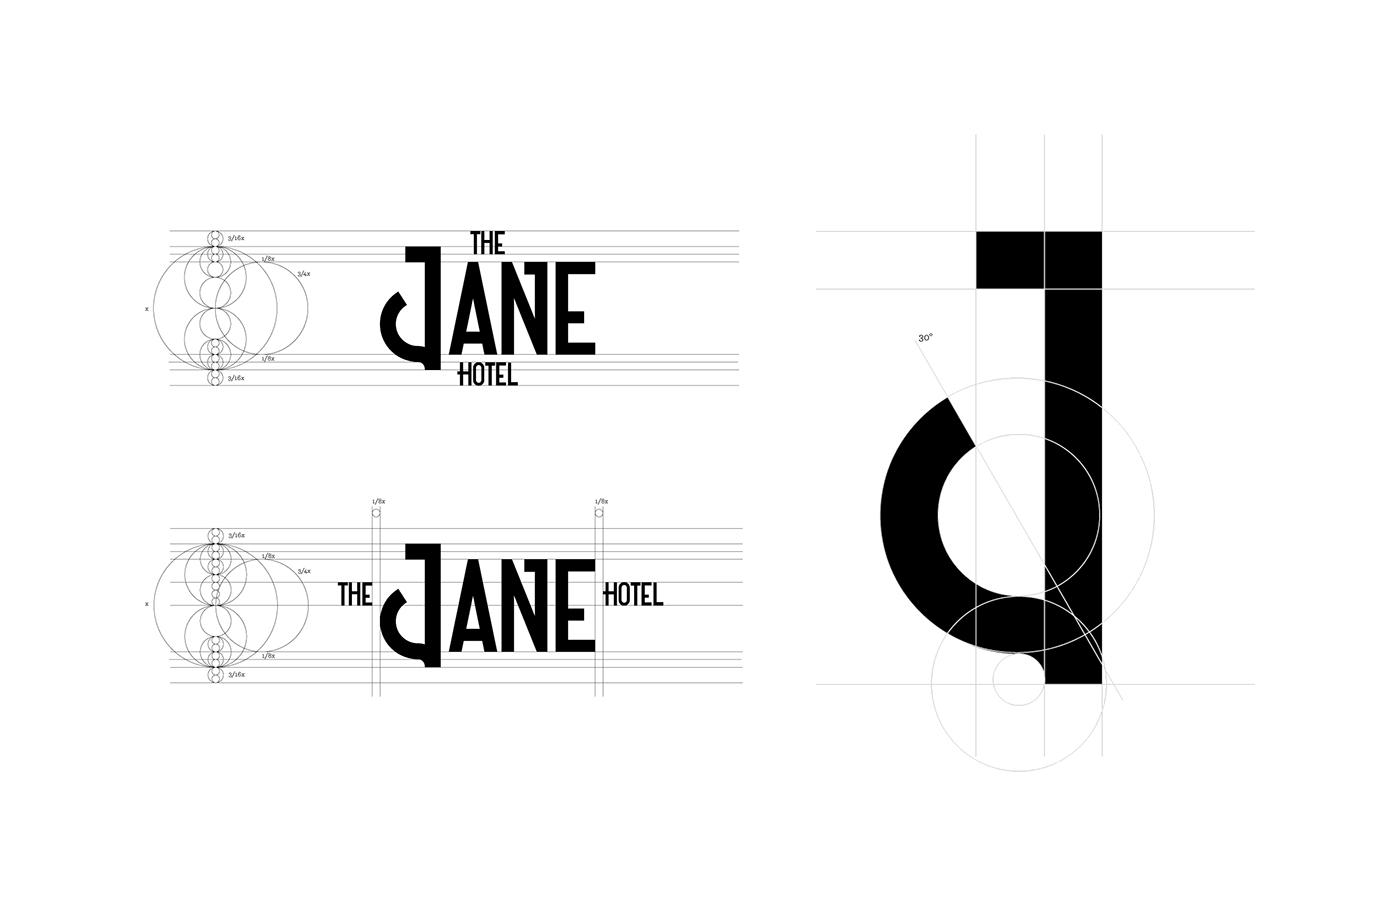 the jane hotel,jane,hotel,Hospitality,rebranding,stationary,nautical,marine,vintage,hostel